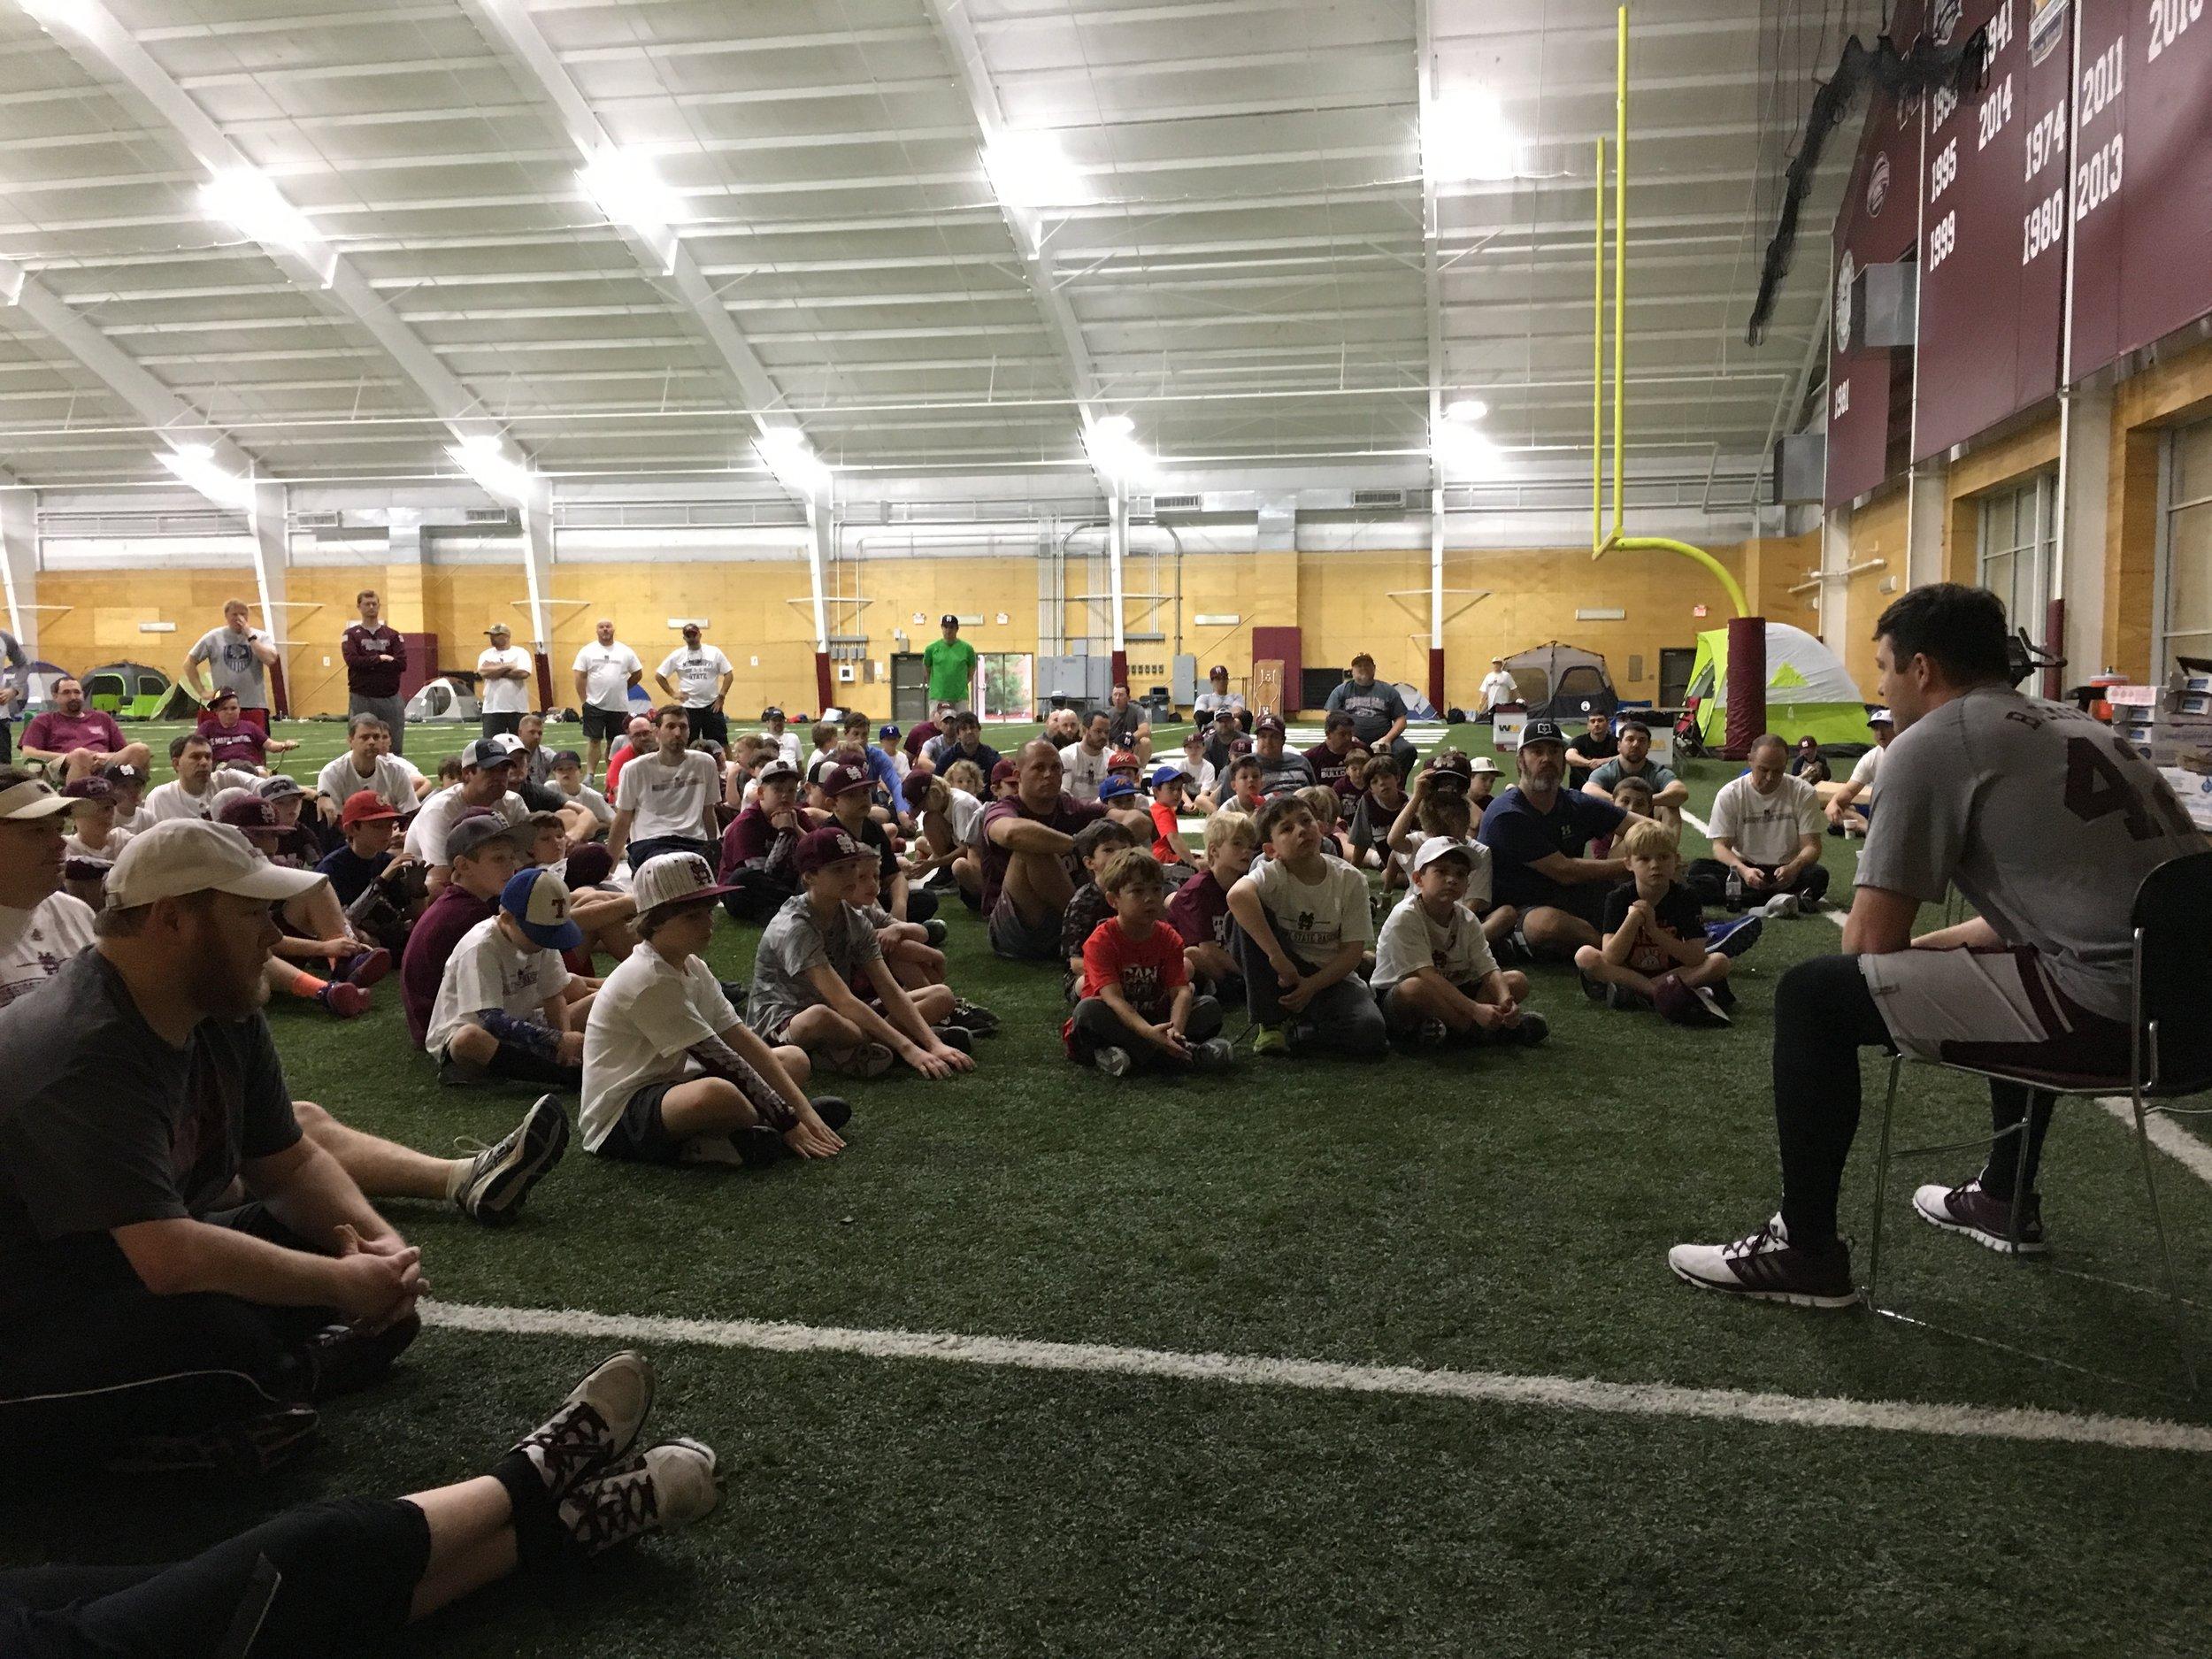 MSU pitcher Blake smith sharing his testimony at father-son baseball camp